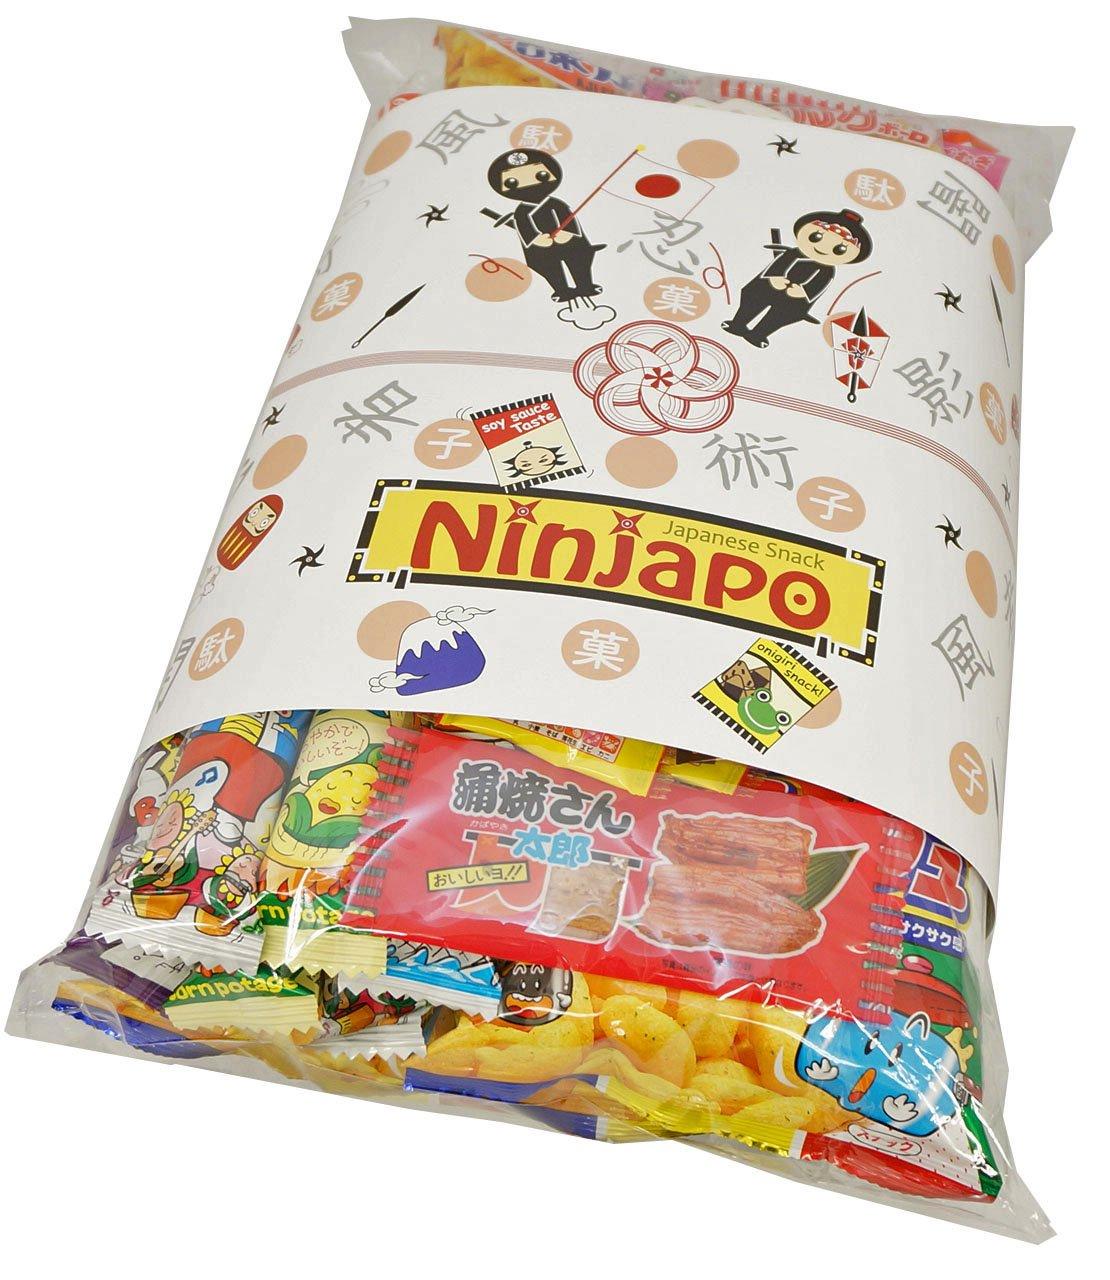 Assorted Japanese Junk Food Snacks